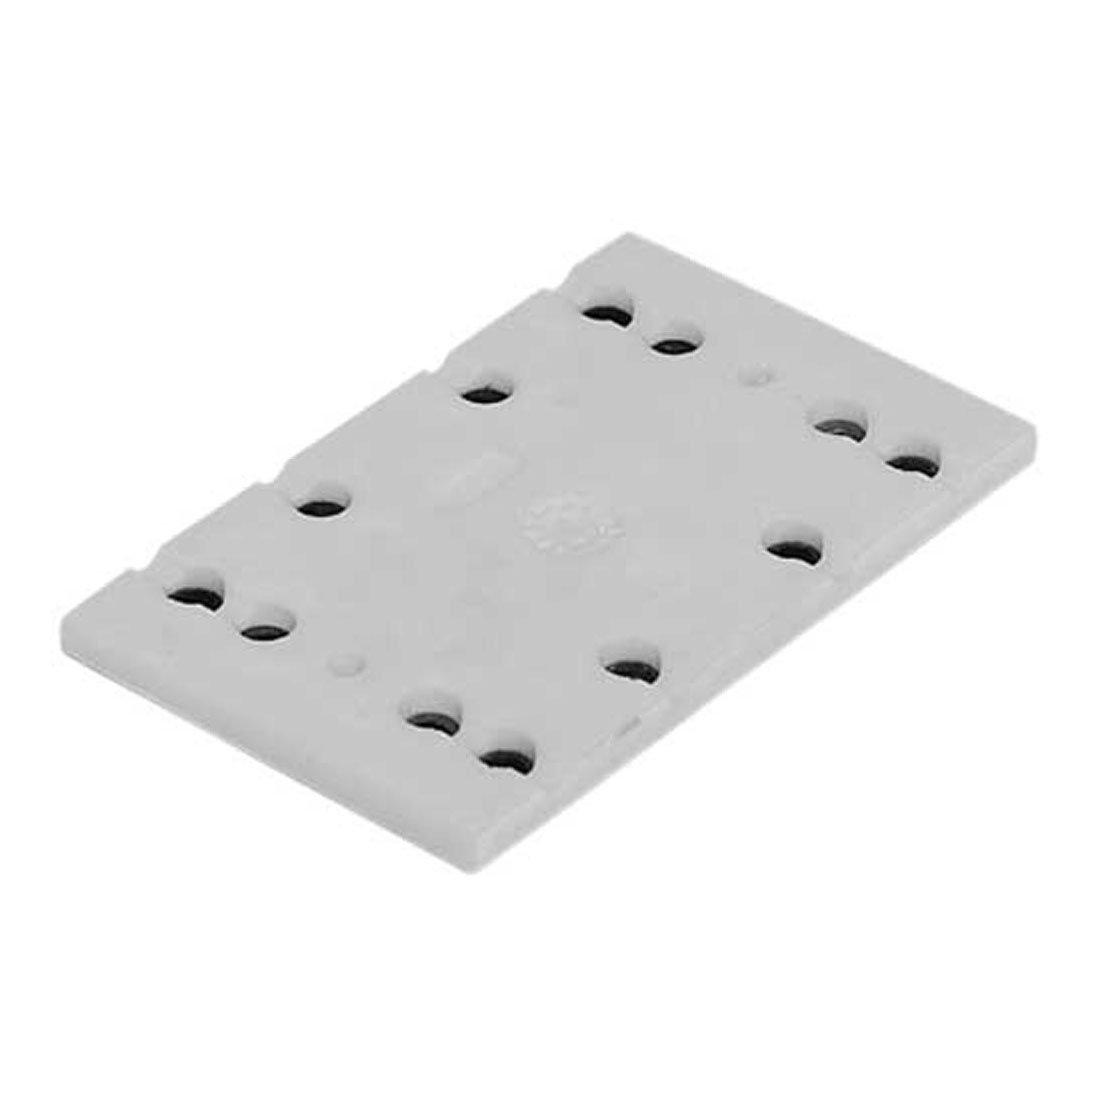 Festool schleifschuh stickfix ssh-stf-80x130//8